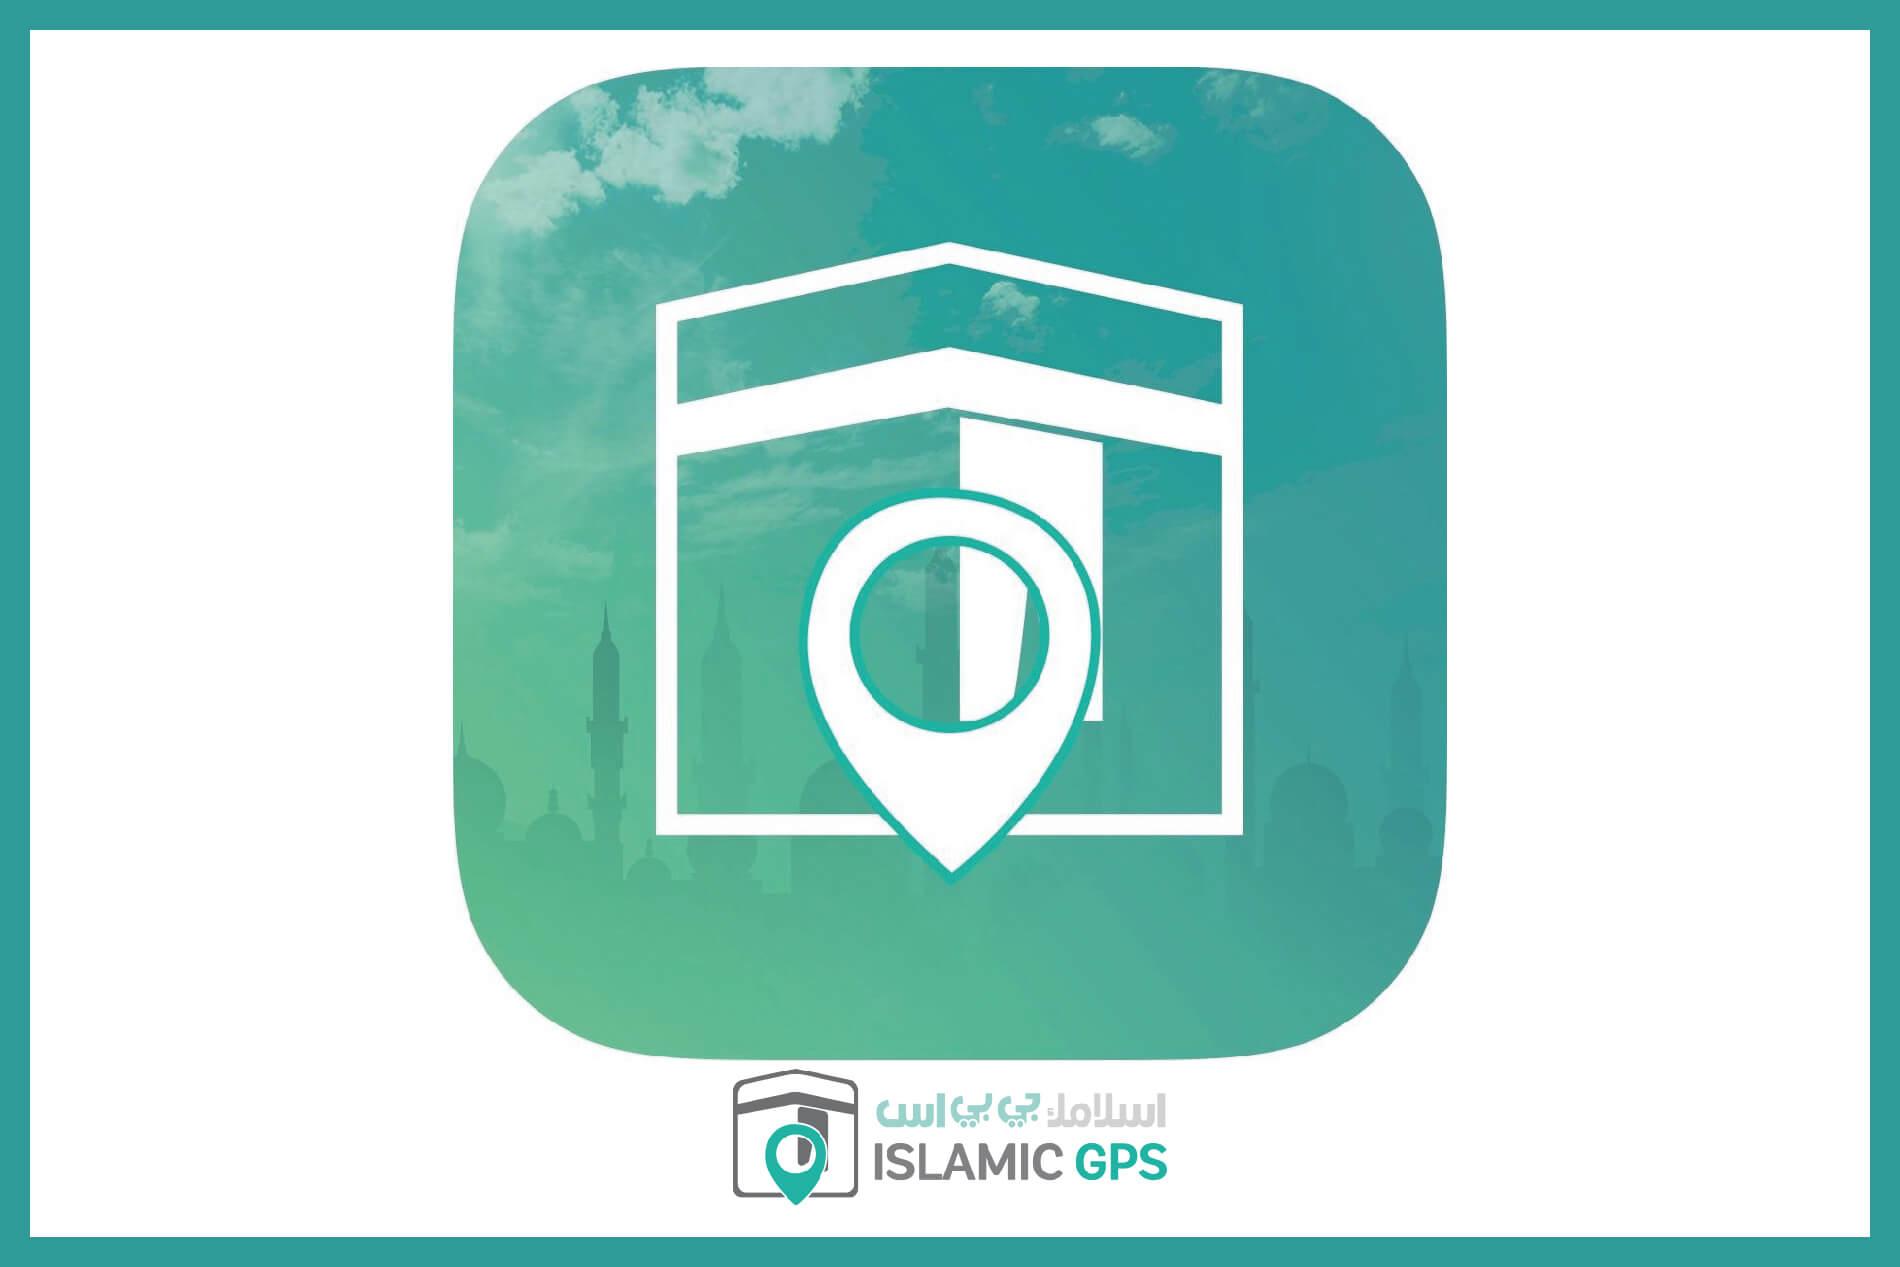 Islamic GPS App Logo